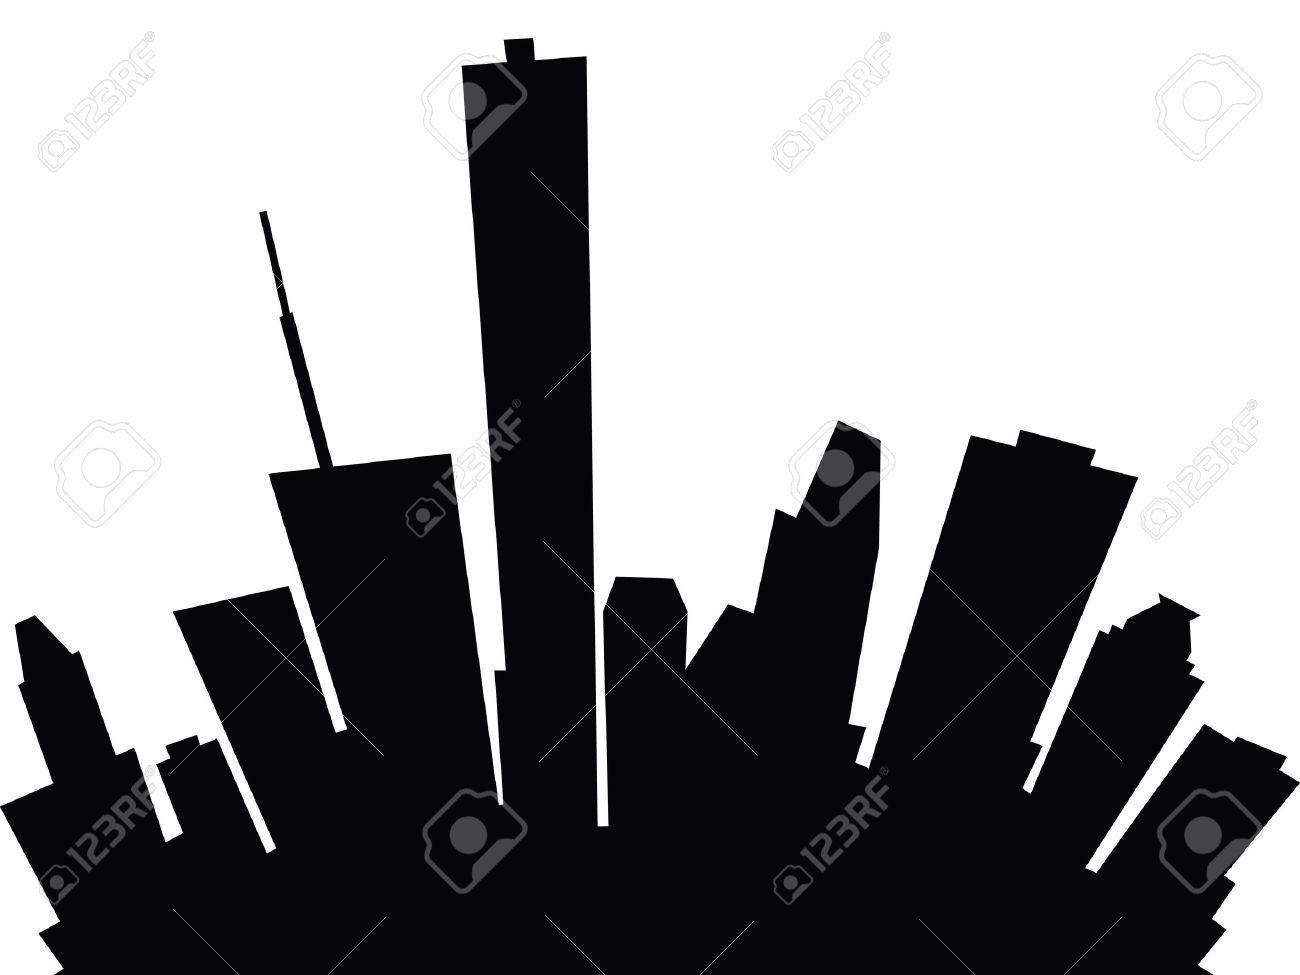 Cartoon Skyline Silhouette Of The City Of Houston, Texas, Usa